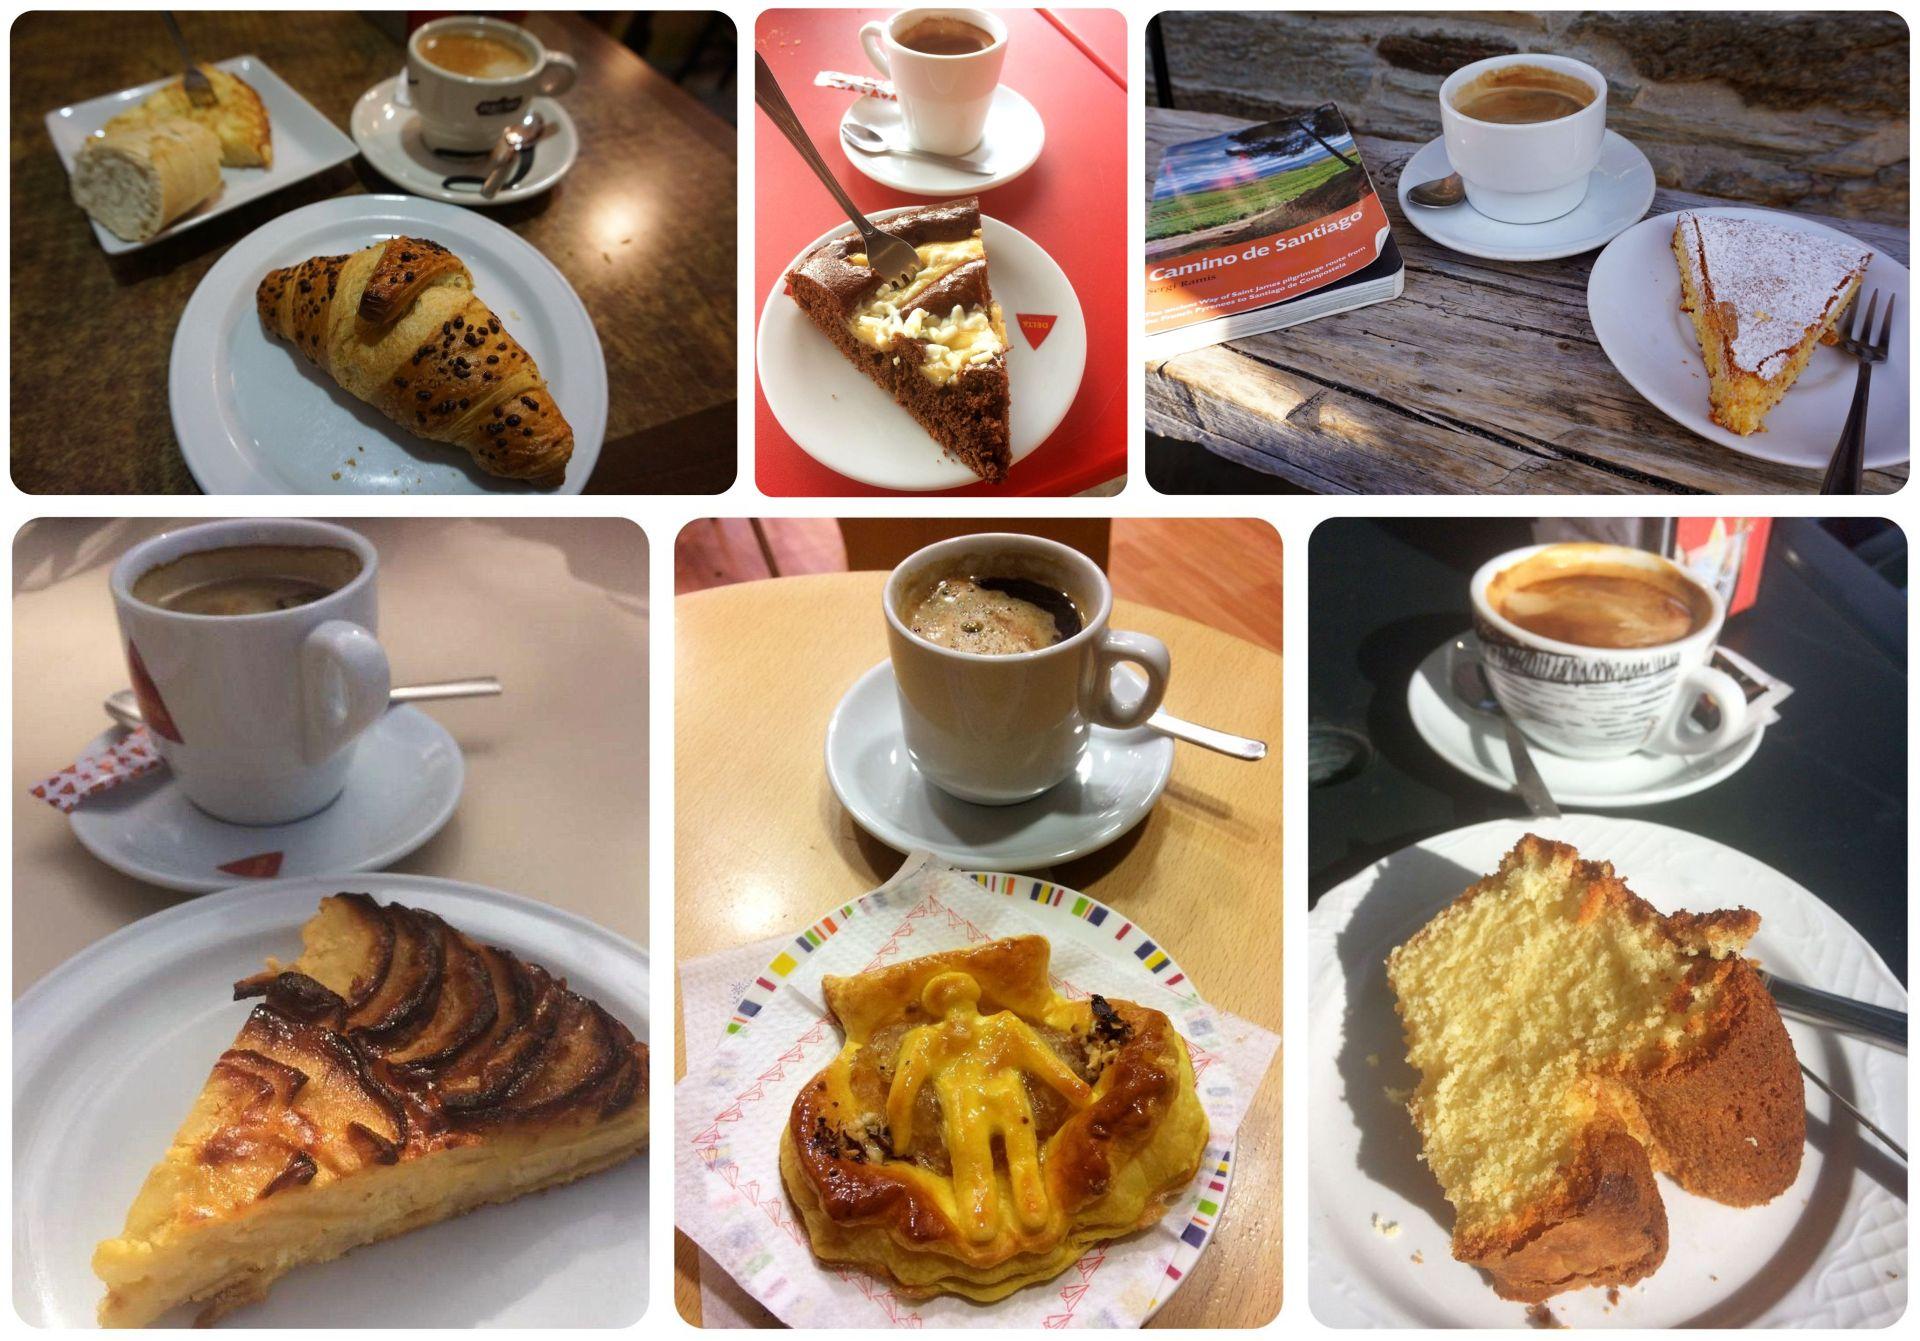 Camino de Santiago Cakes